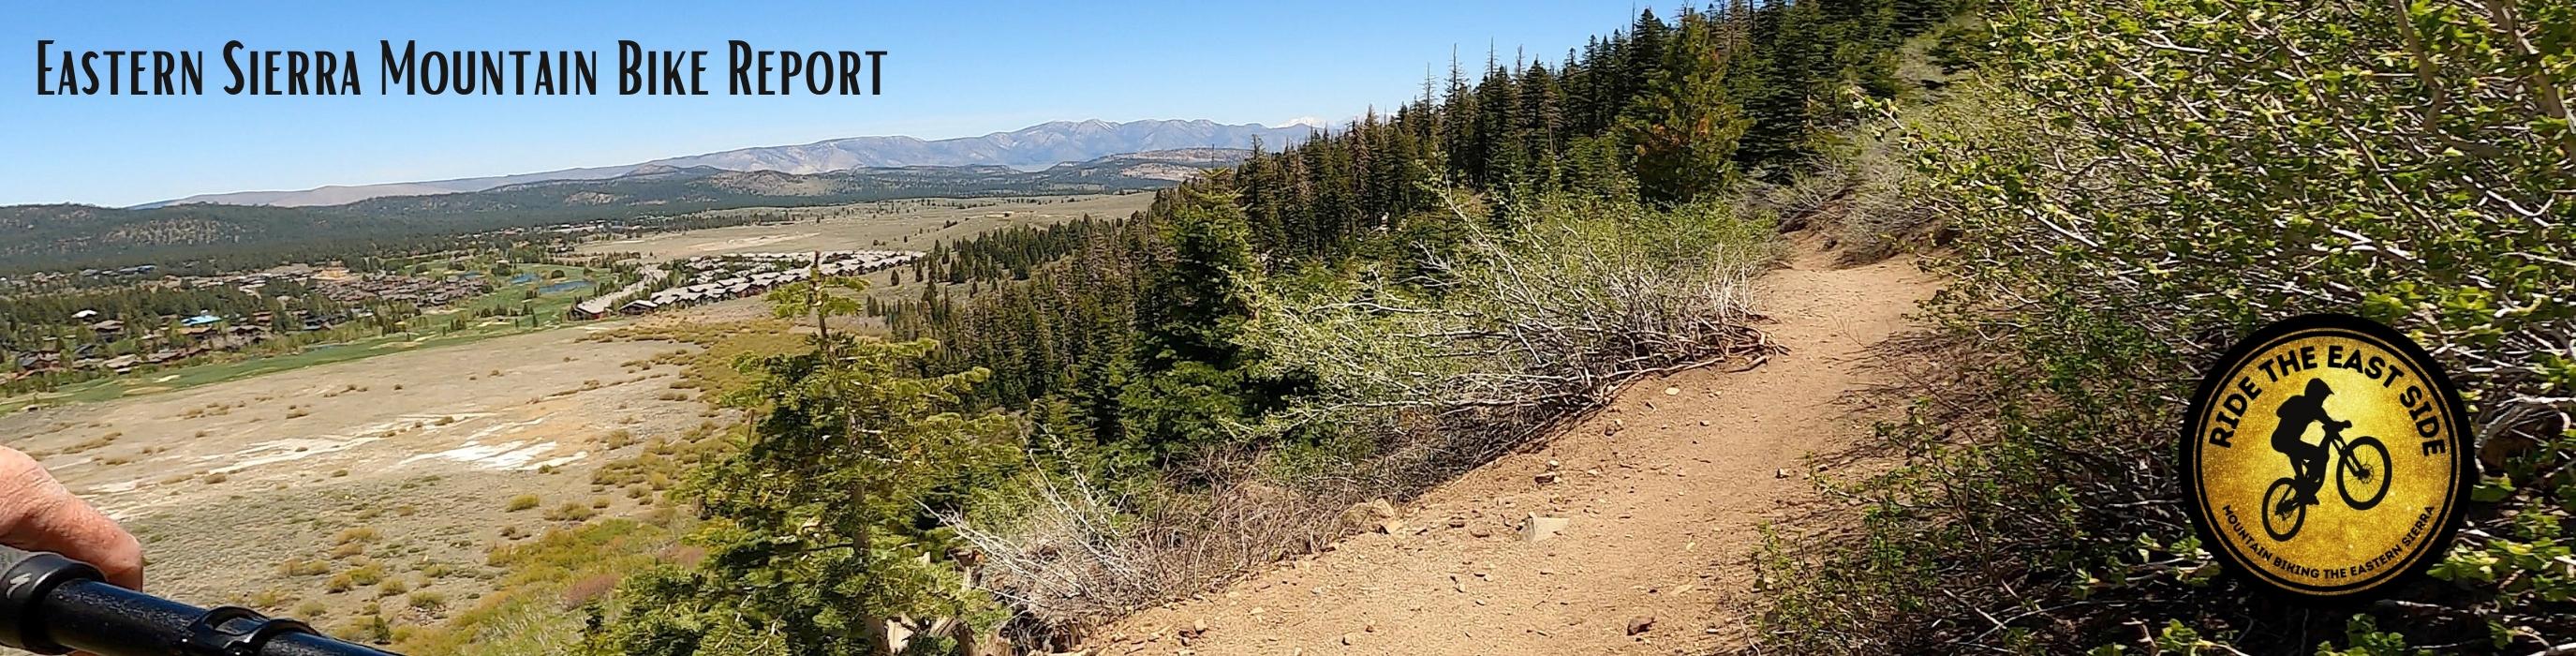 Eastern Sierra and Mammoth Mountain Mountain Bike Report